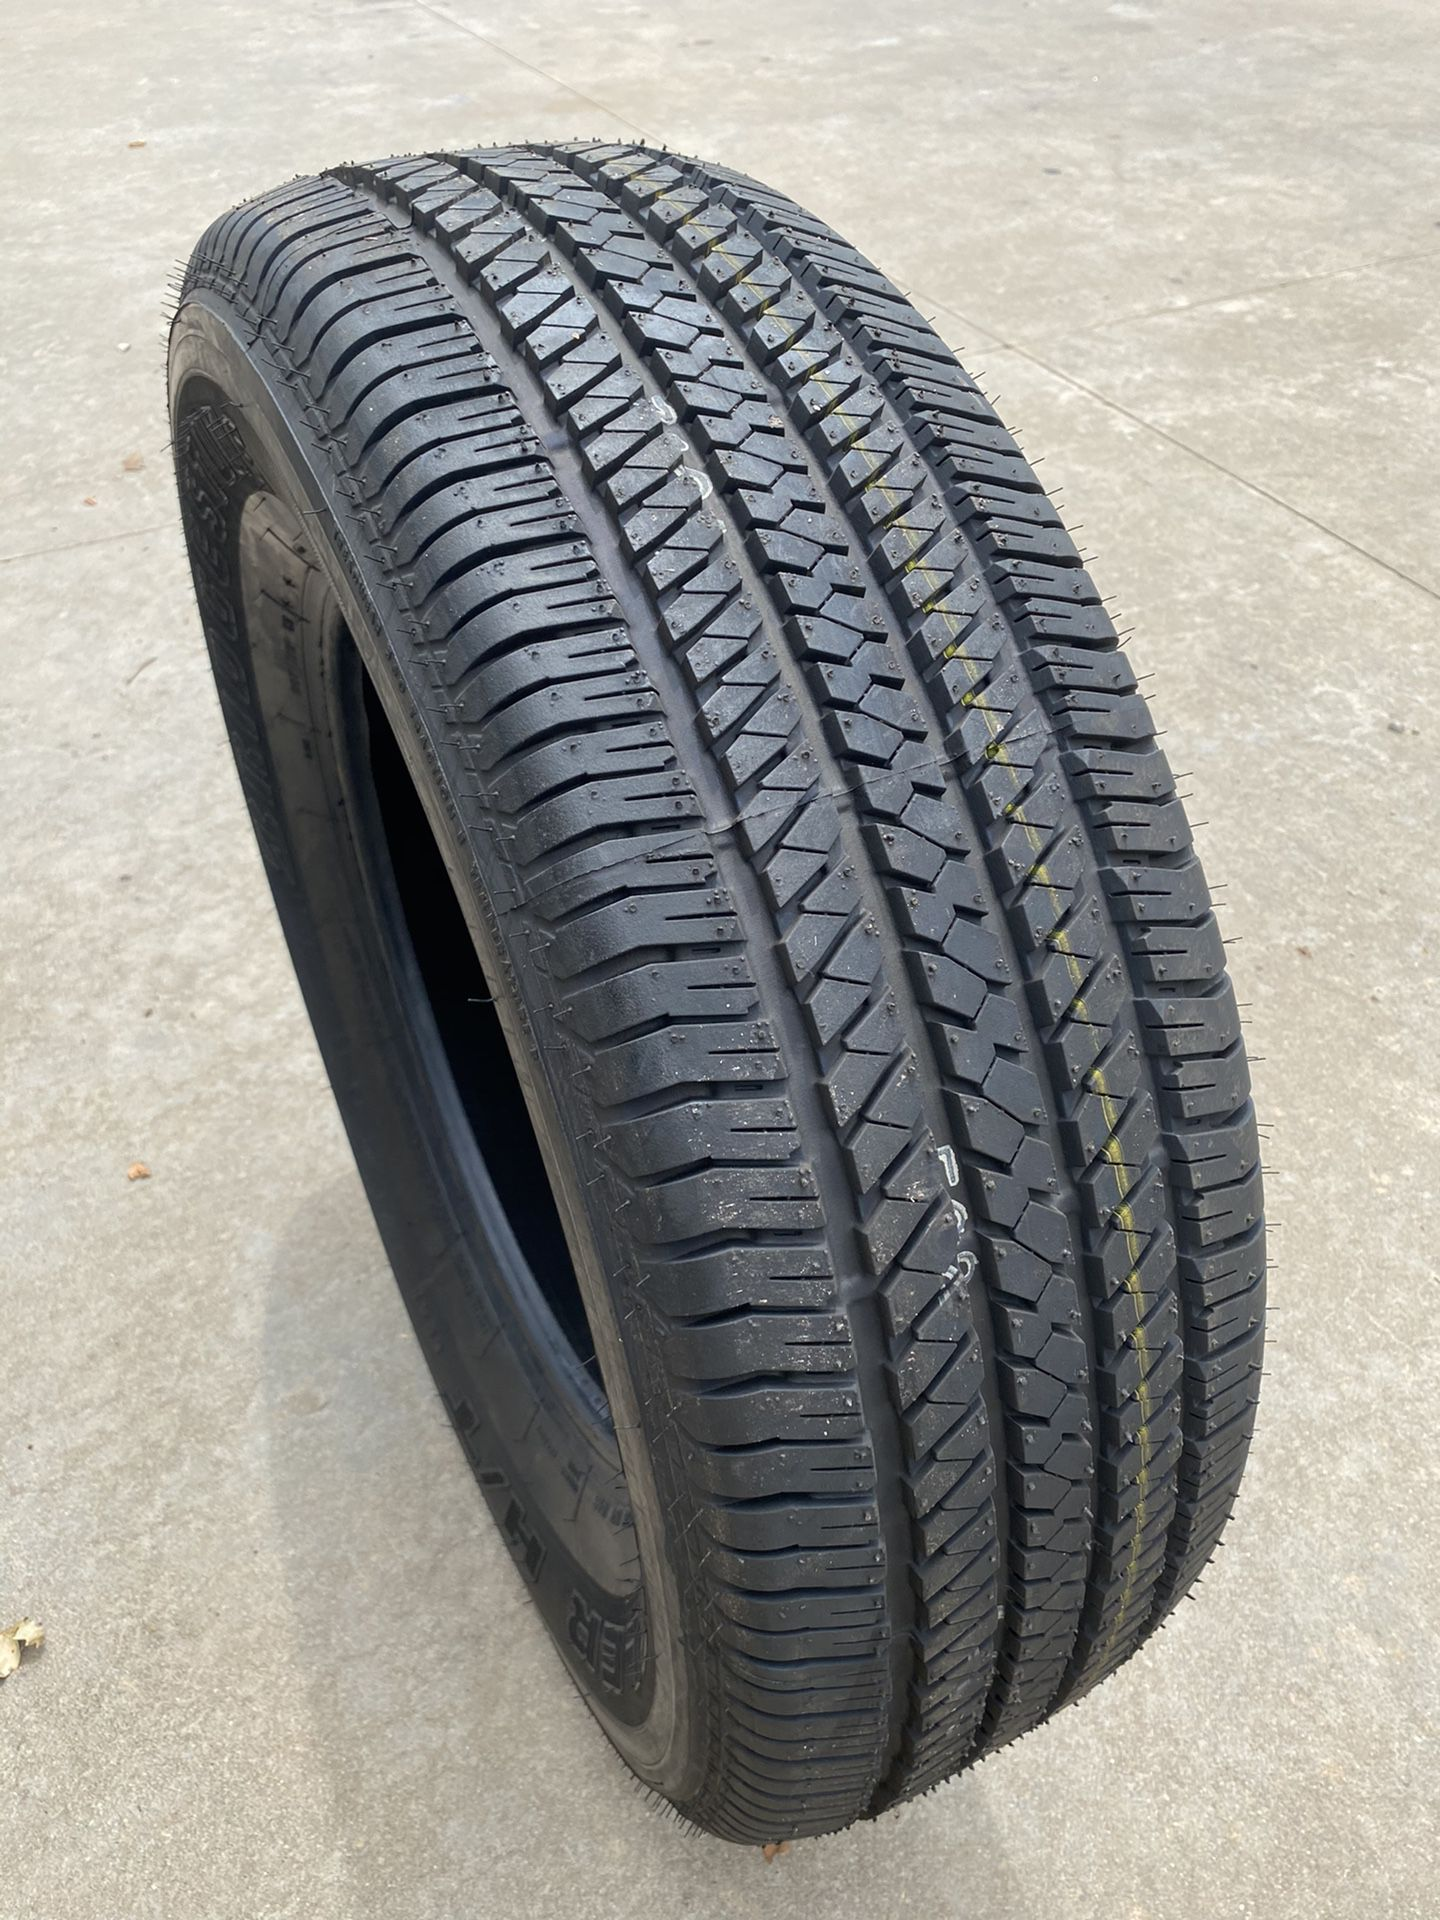 255/70/18 Bridgestone Dueler New Tires